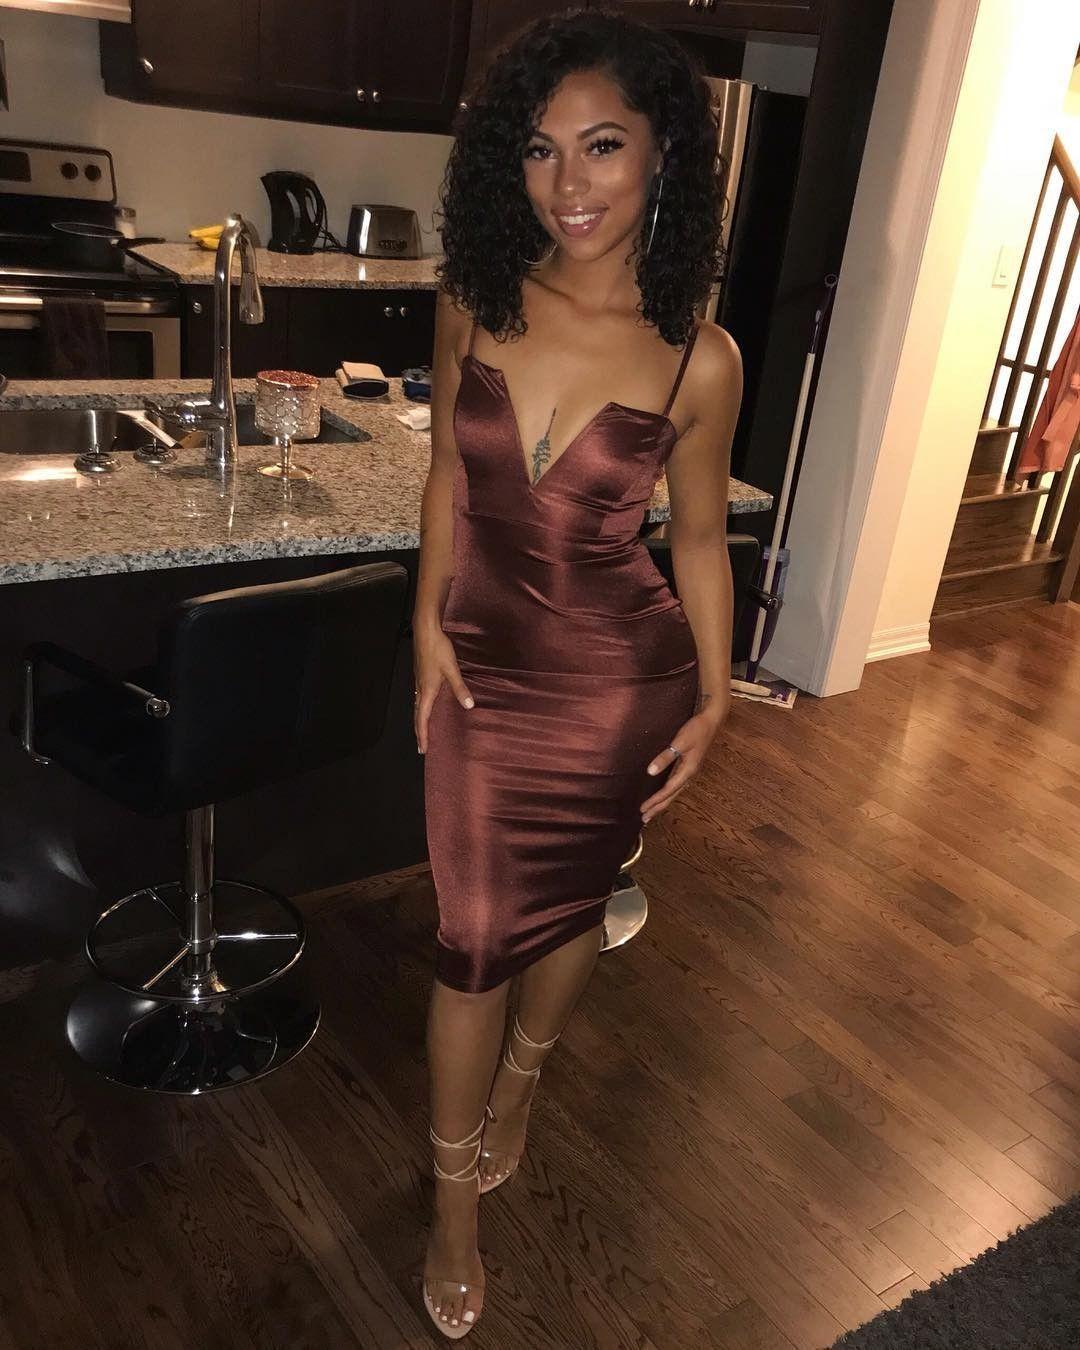 Arab beurette girls robe sexy sandale noir lyon part dieu - 3 3